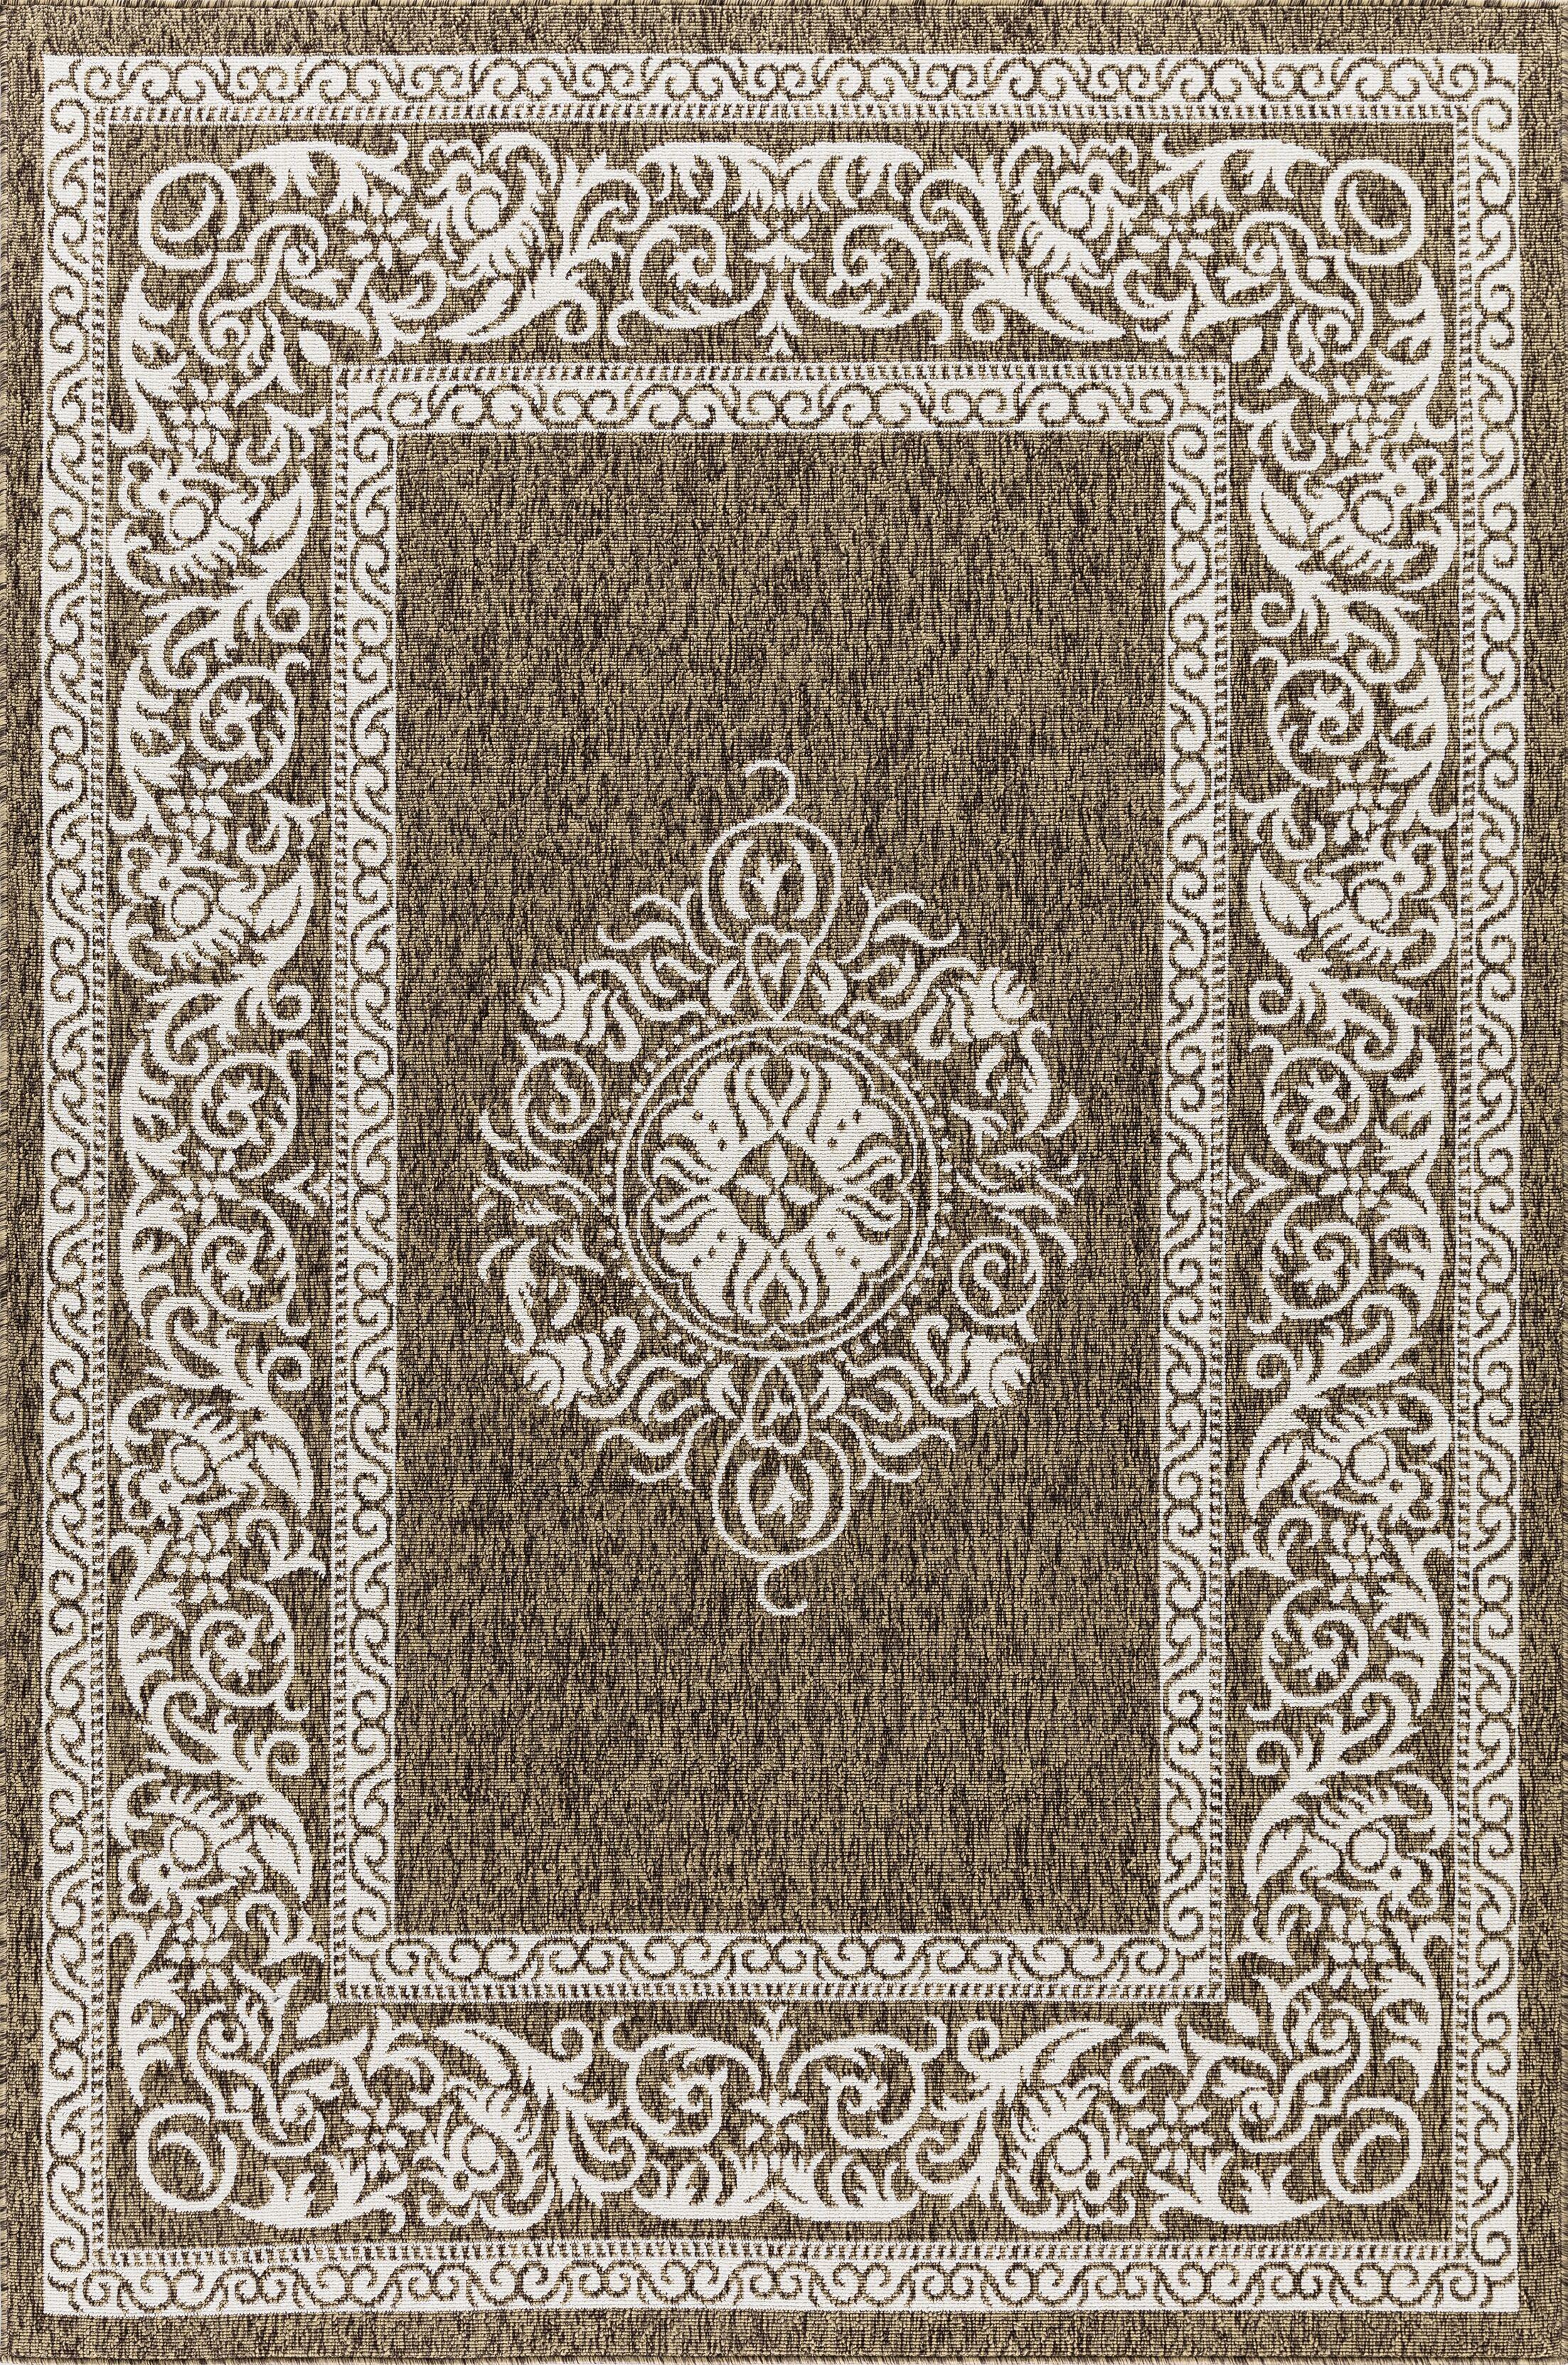 Ramos Beautiful Brown Indoor/Outdoor Area Rug Rug Size: Rectangle 5'3